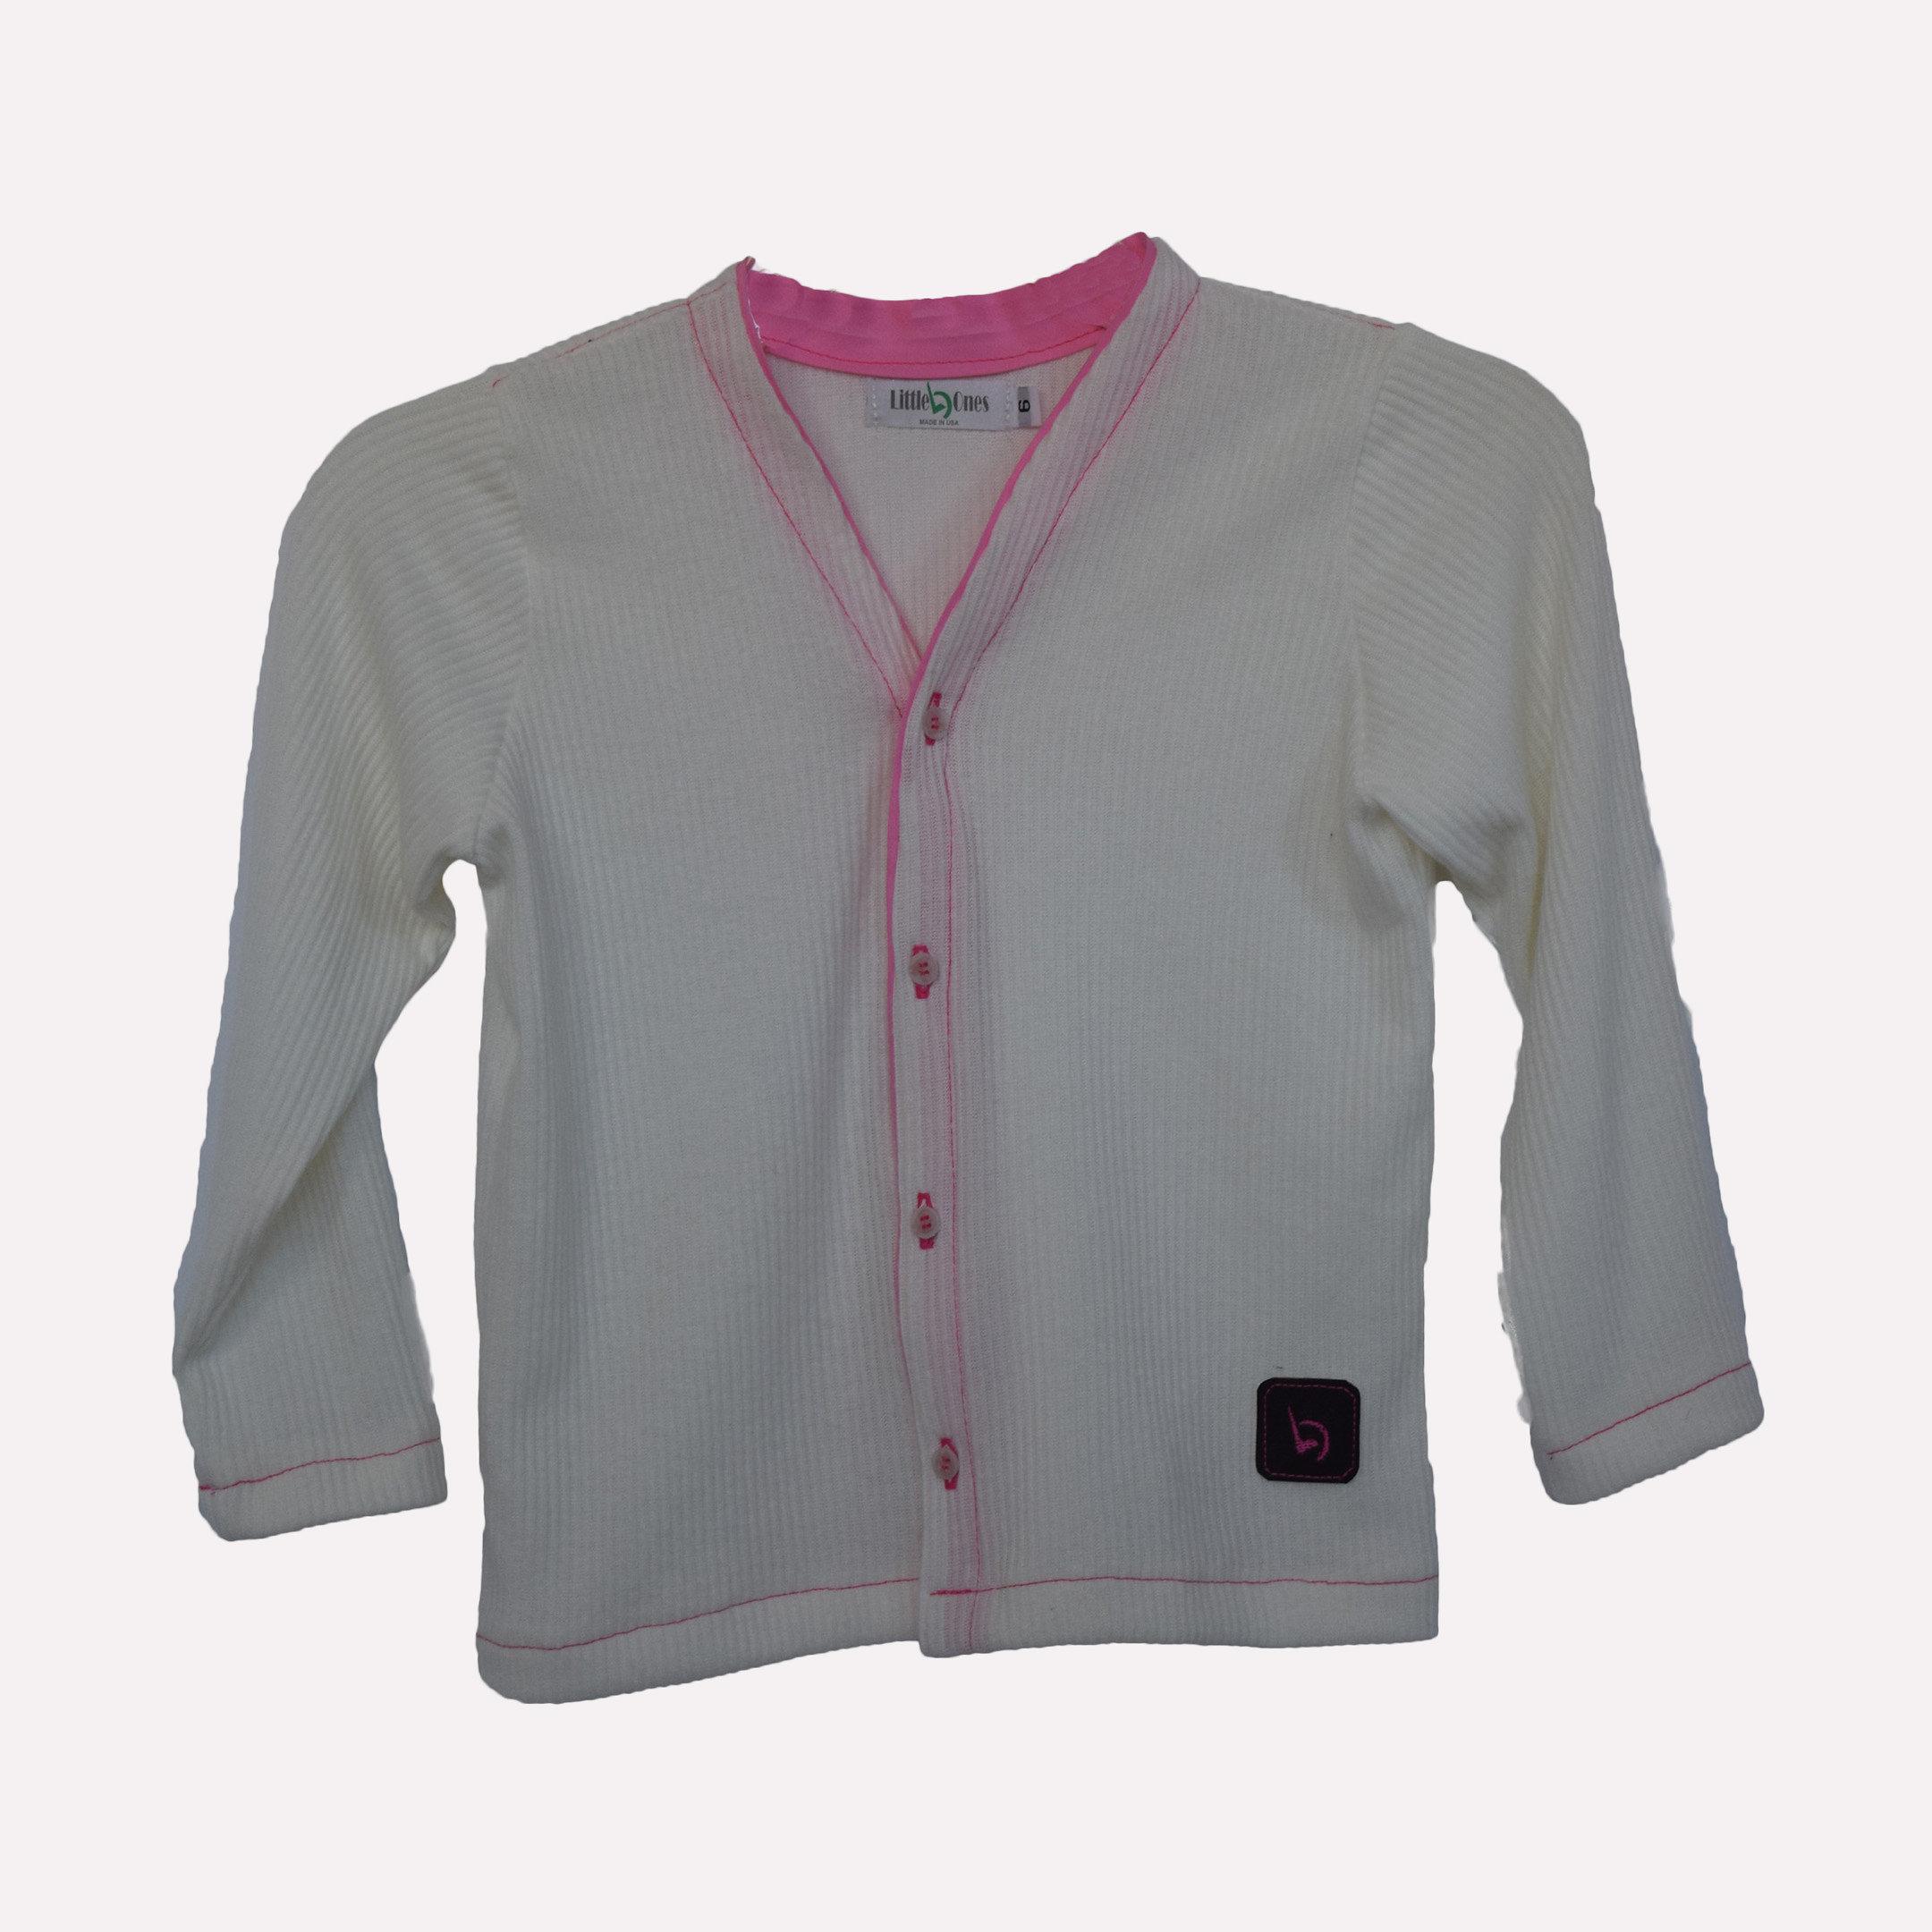 Children's clothing | LO design | United States | White Cardigan